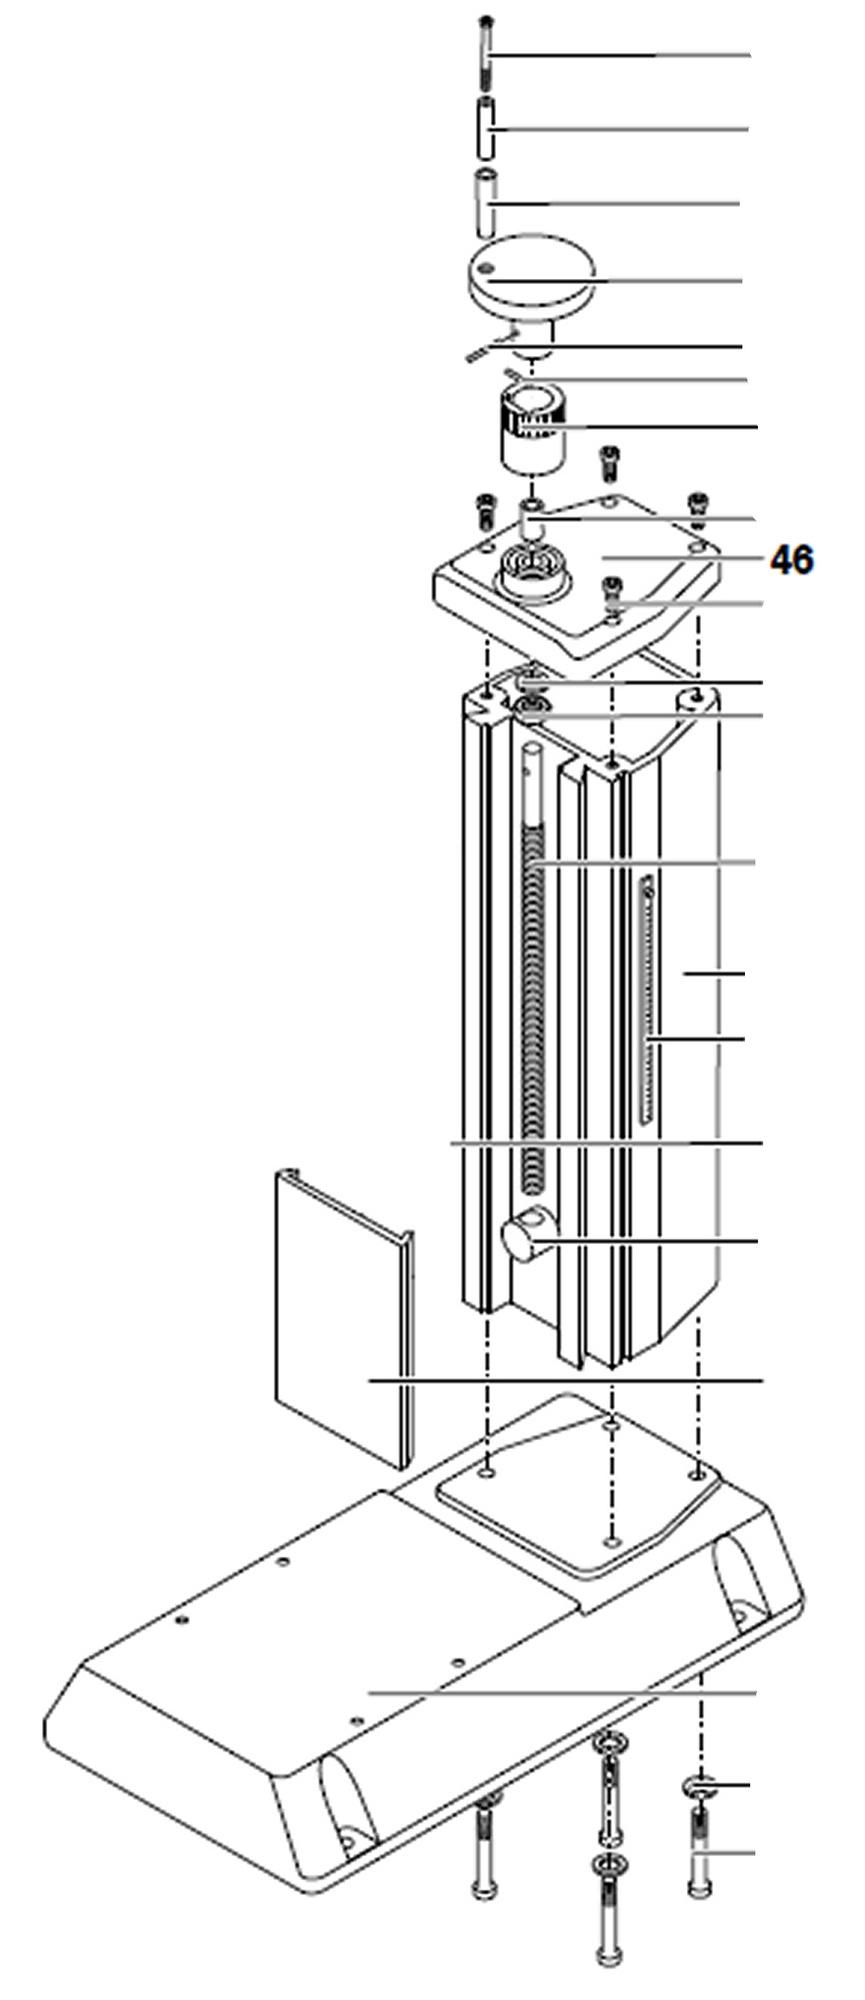 PROXXON 27110-46 Deckel für Micro-Fräse MF 70